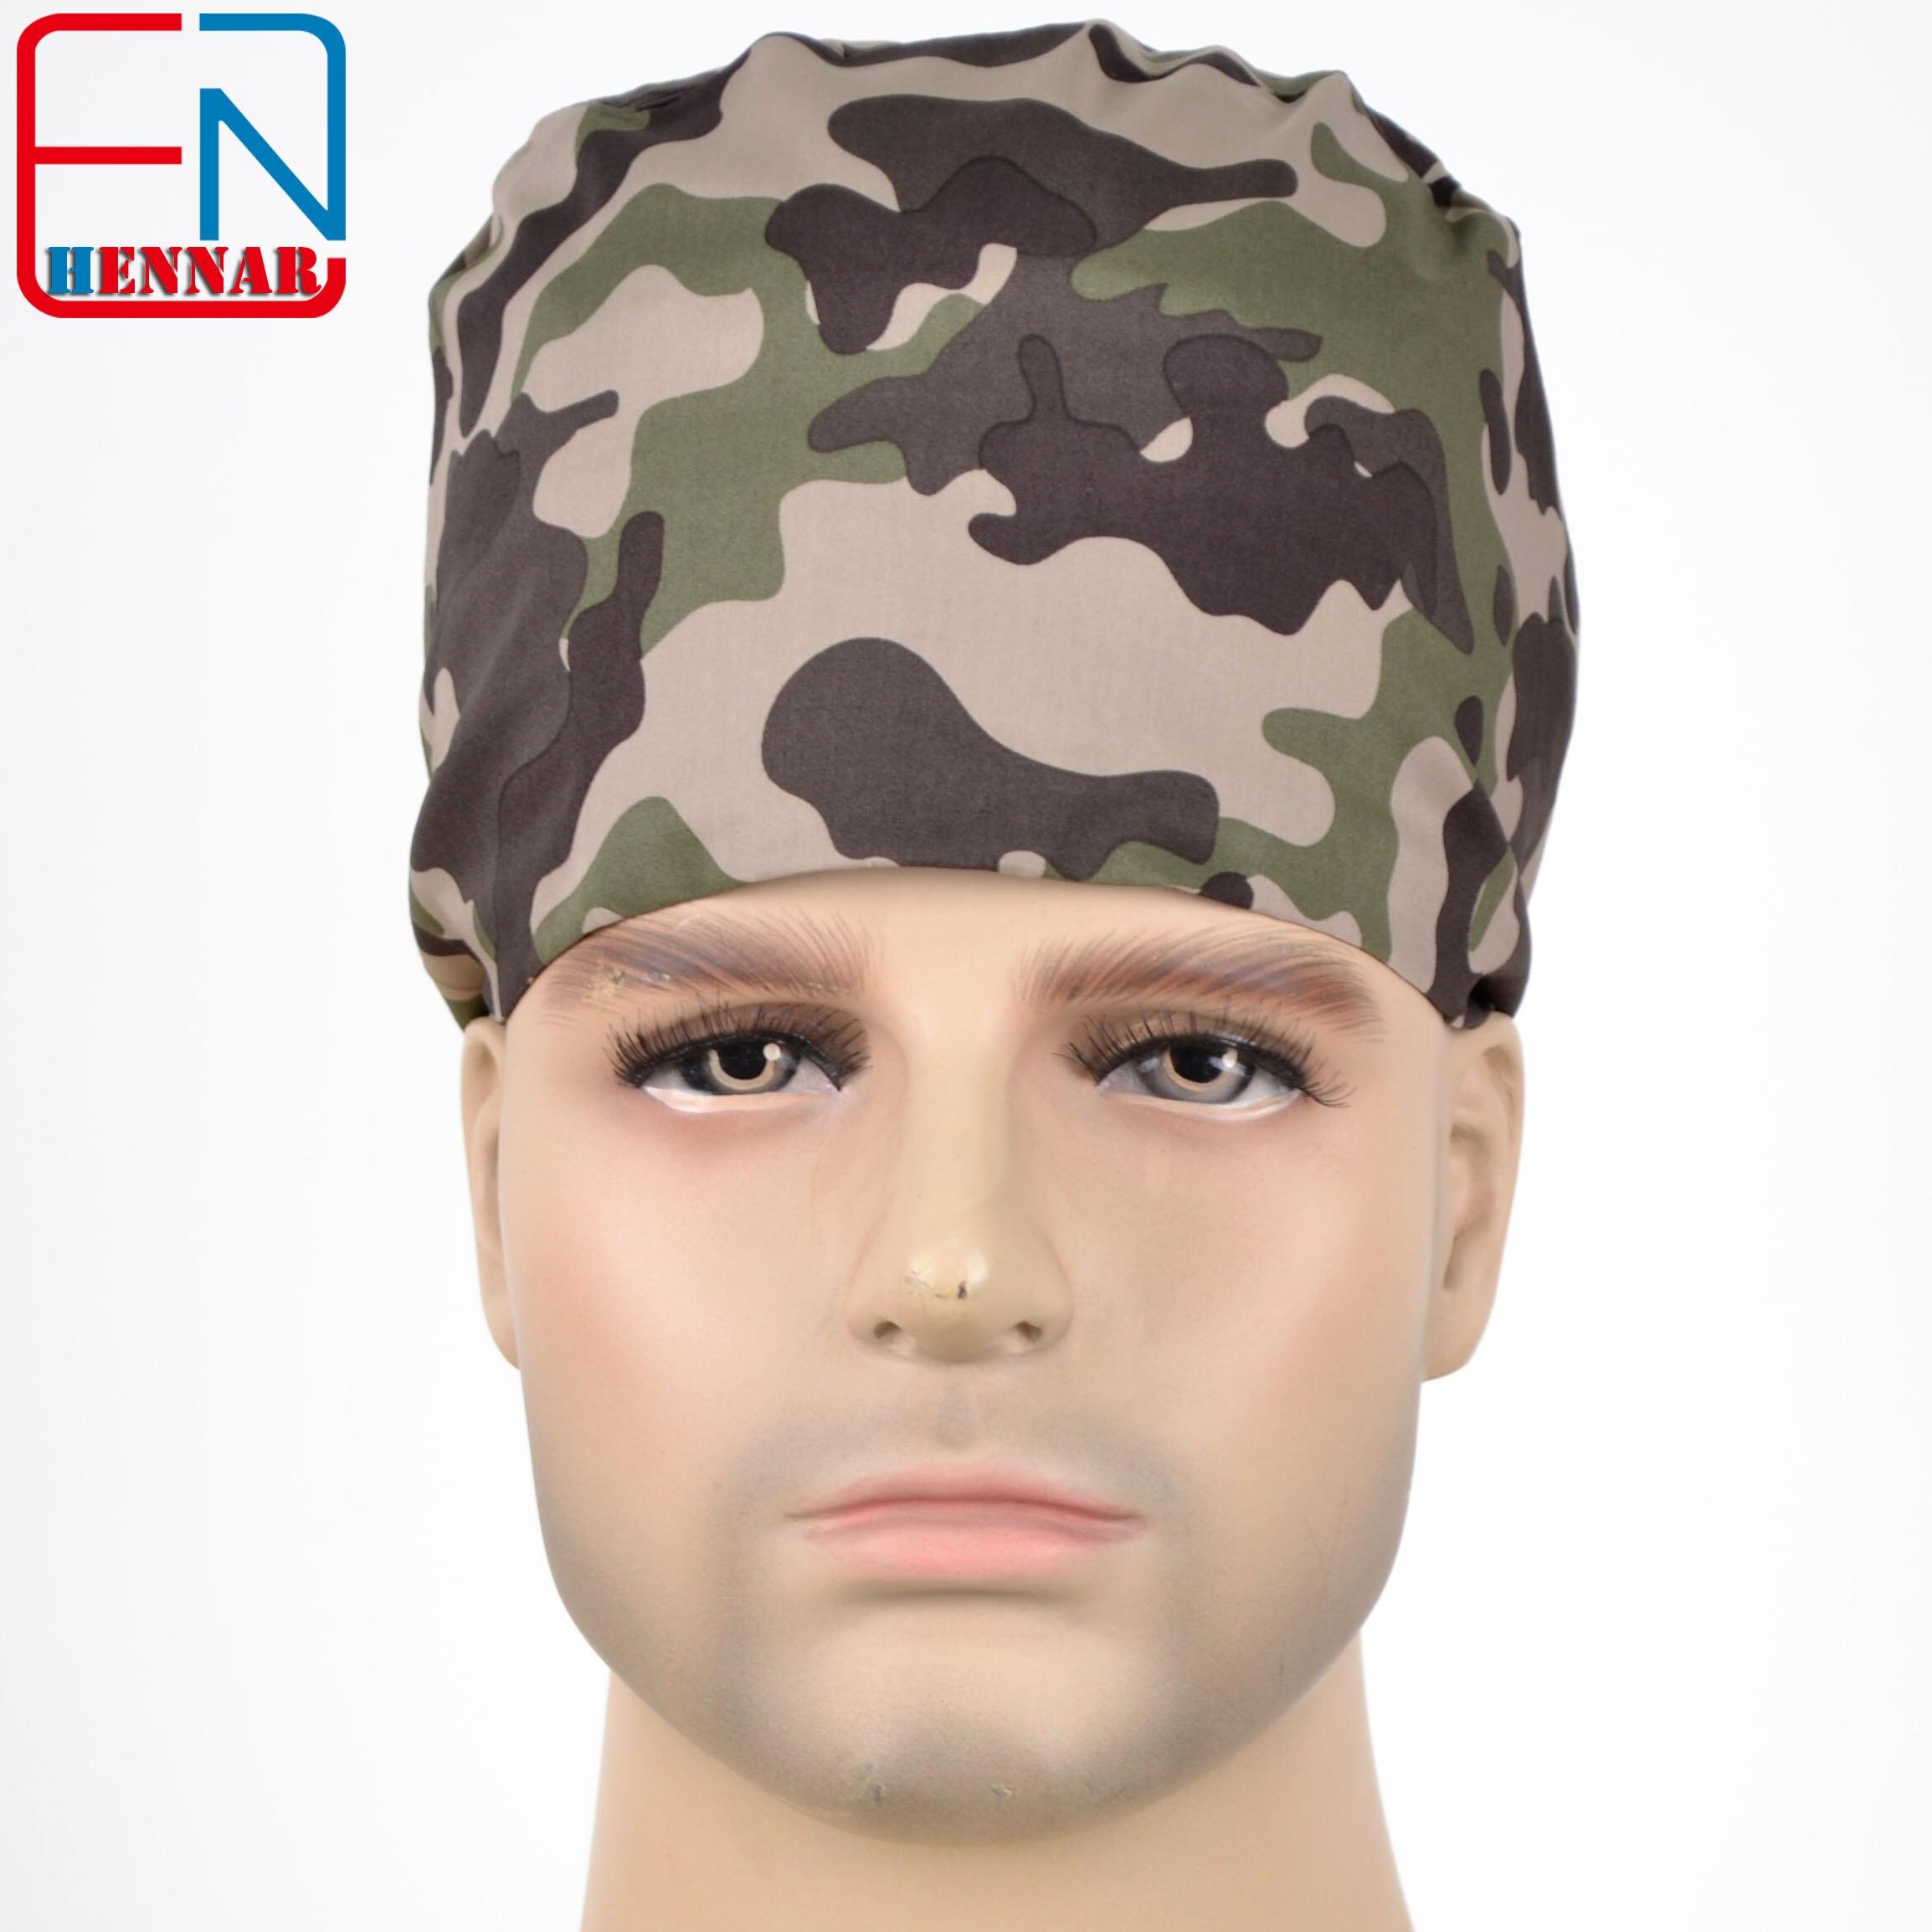 New 180413 Hennar Brand Unisex Surgical Caps Aiyan Xingqiu